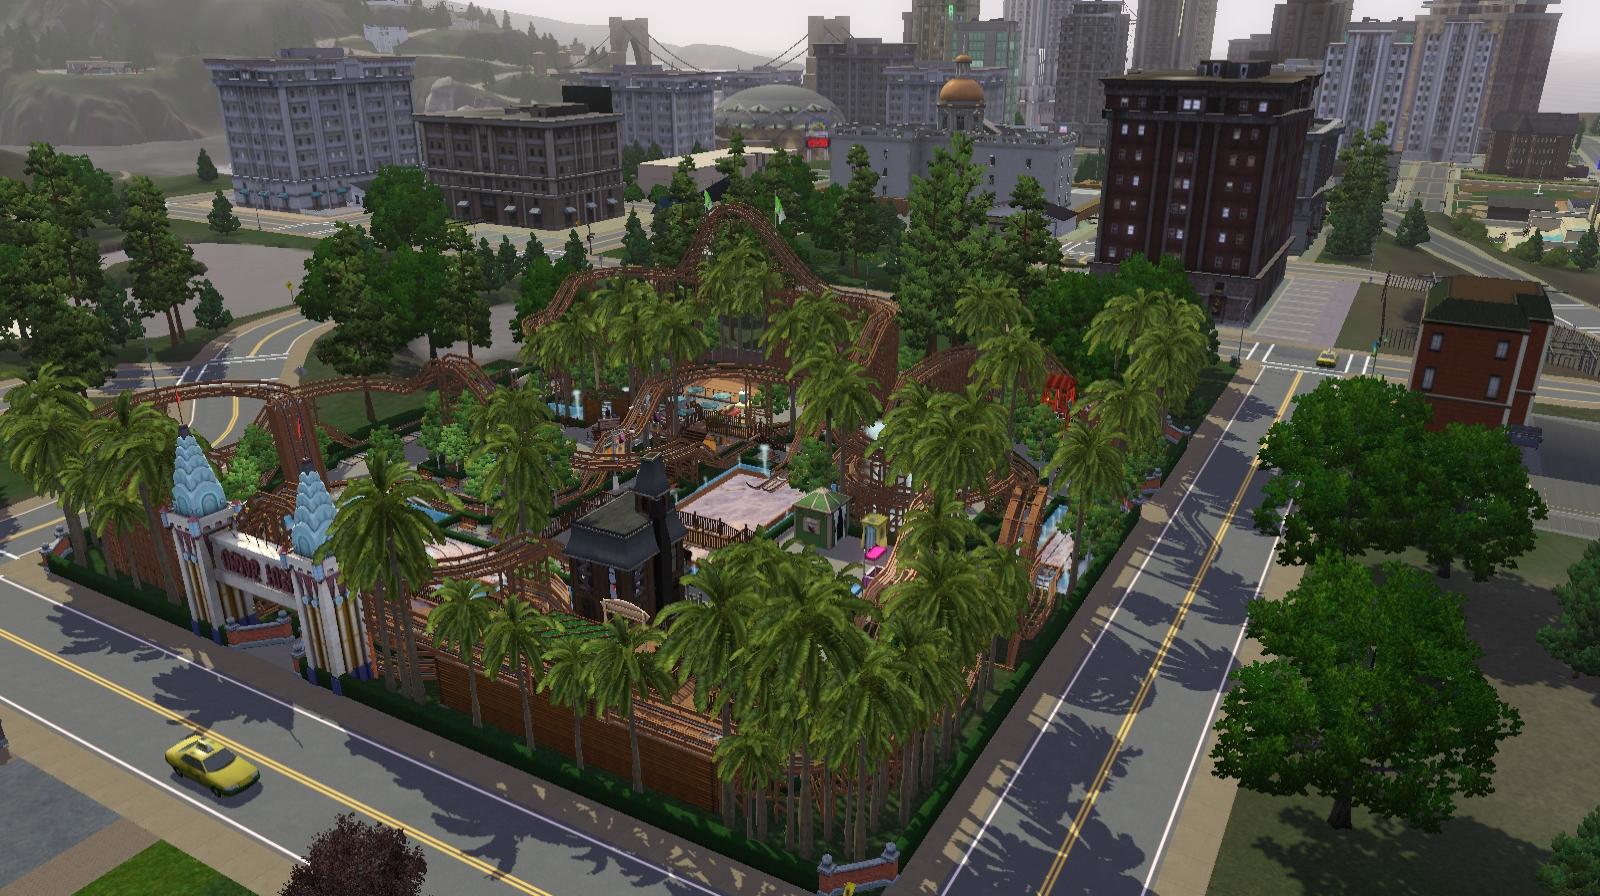 [Descarga] Parque Adventure Park. Screenshot-46